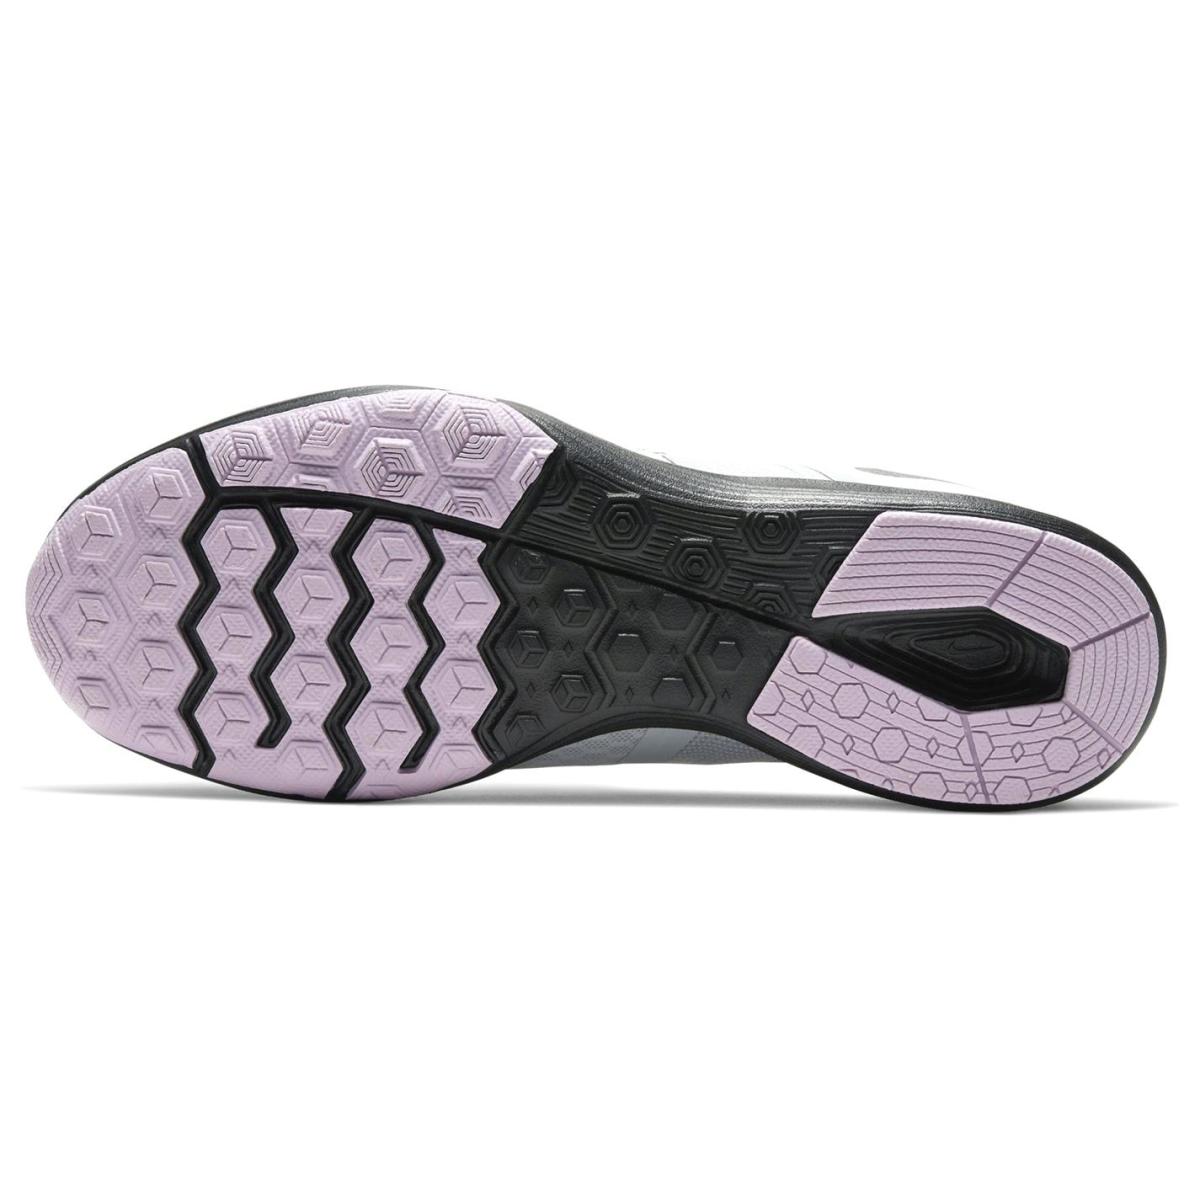 Nike-City-Trainer-2-Turnschuhe-Laufschuhe-Damen-Sportschuhe-Sneaker-3121 Indexbild 15